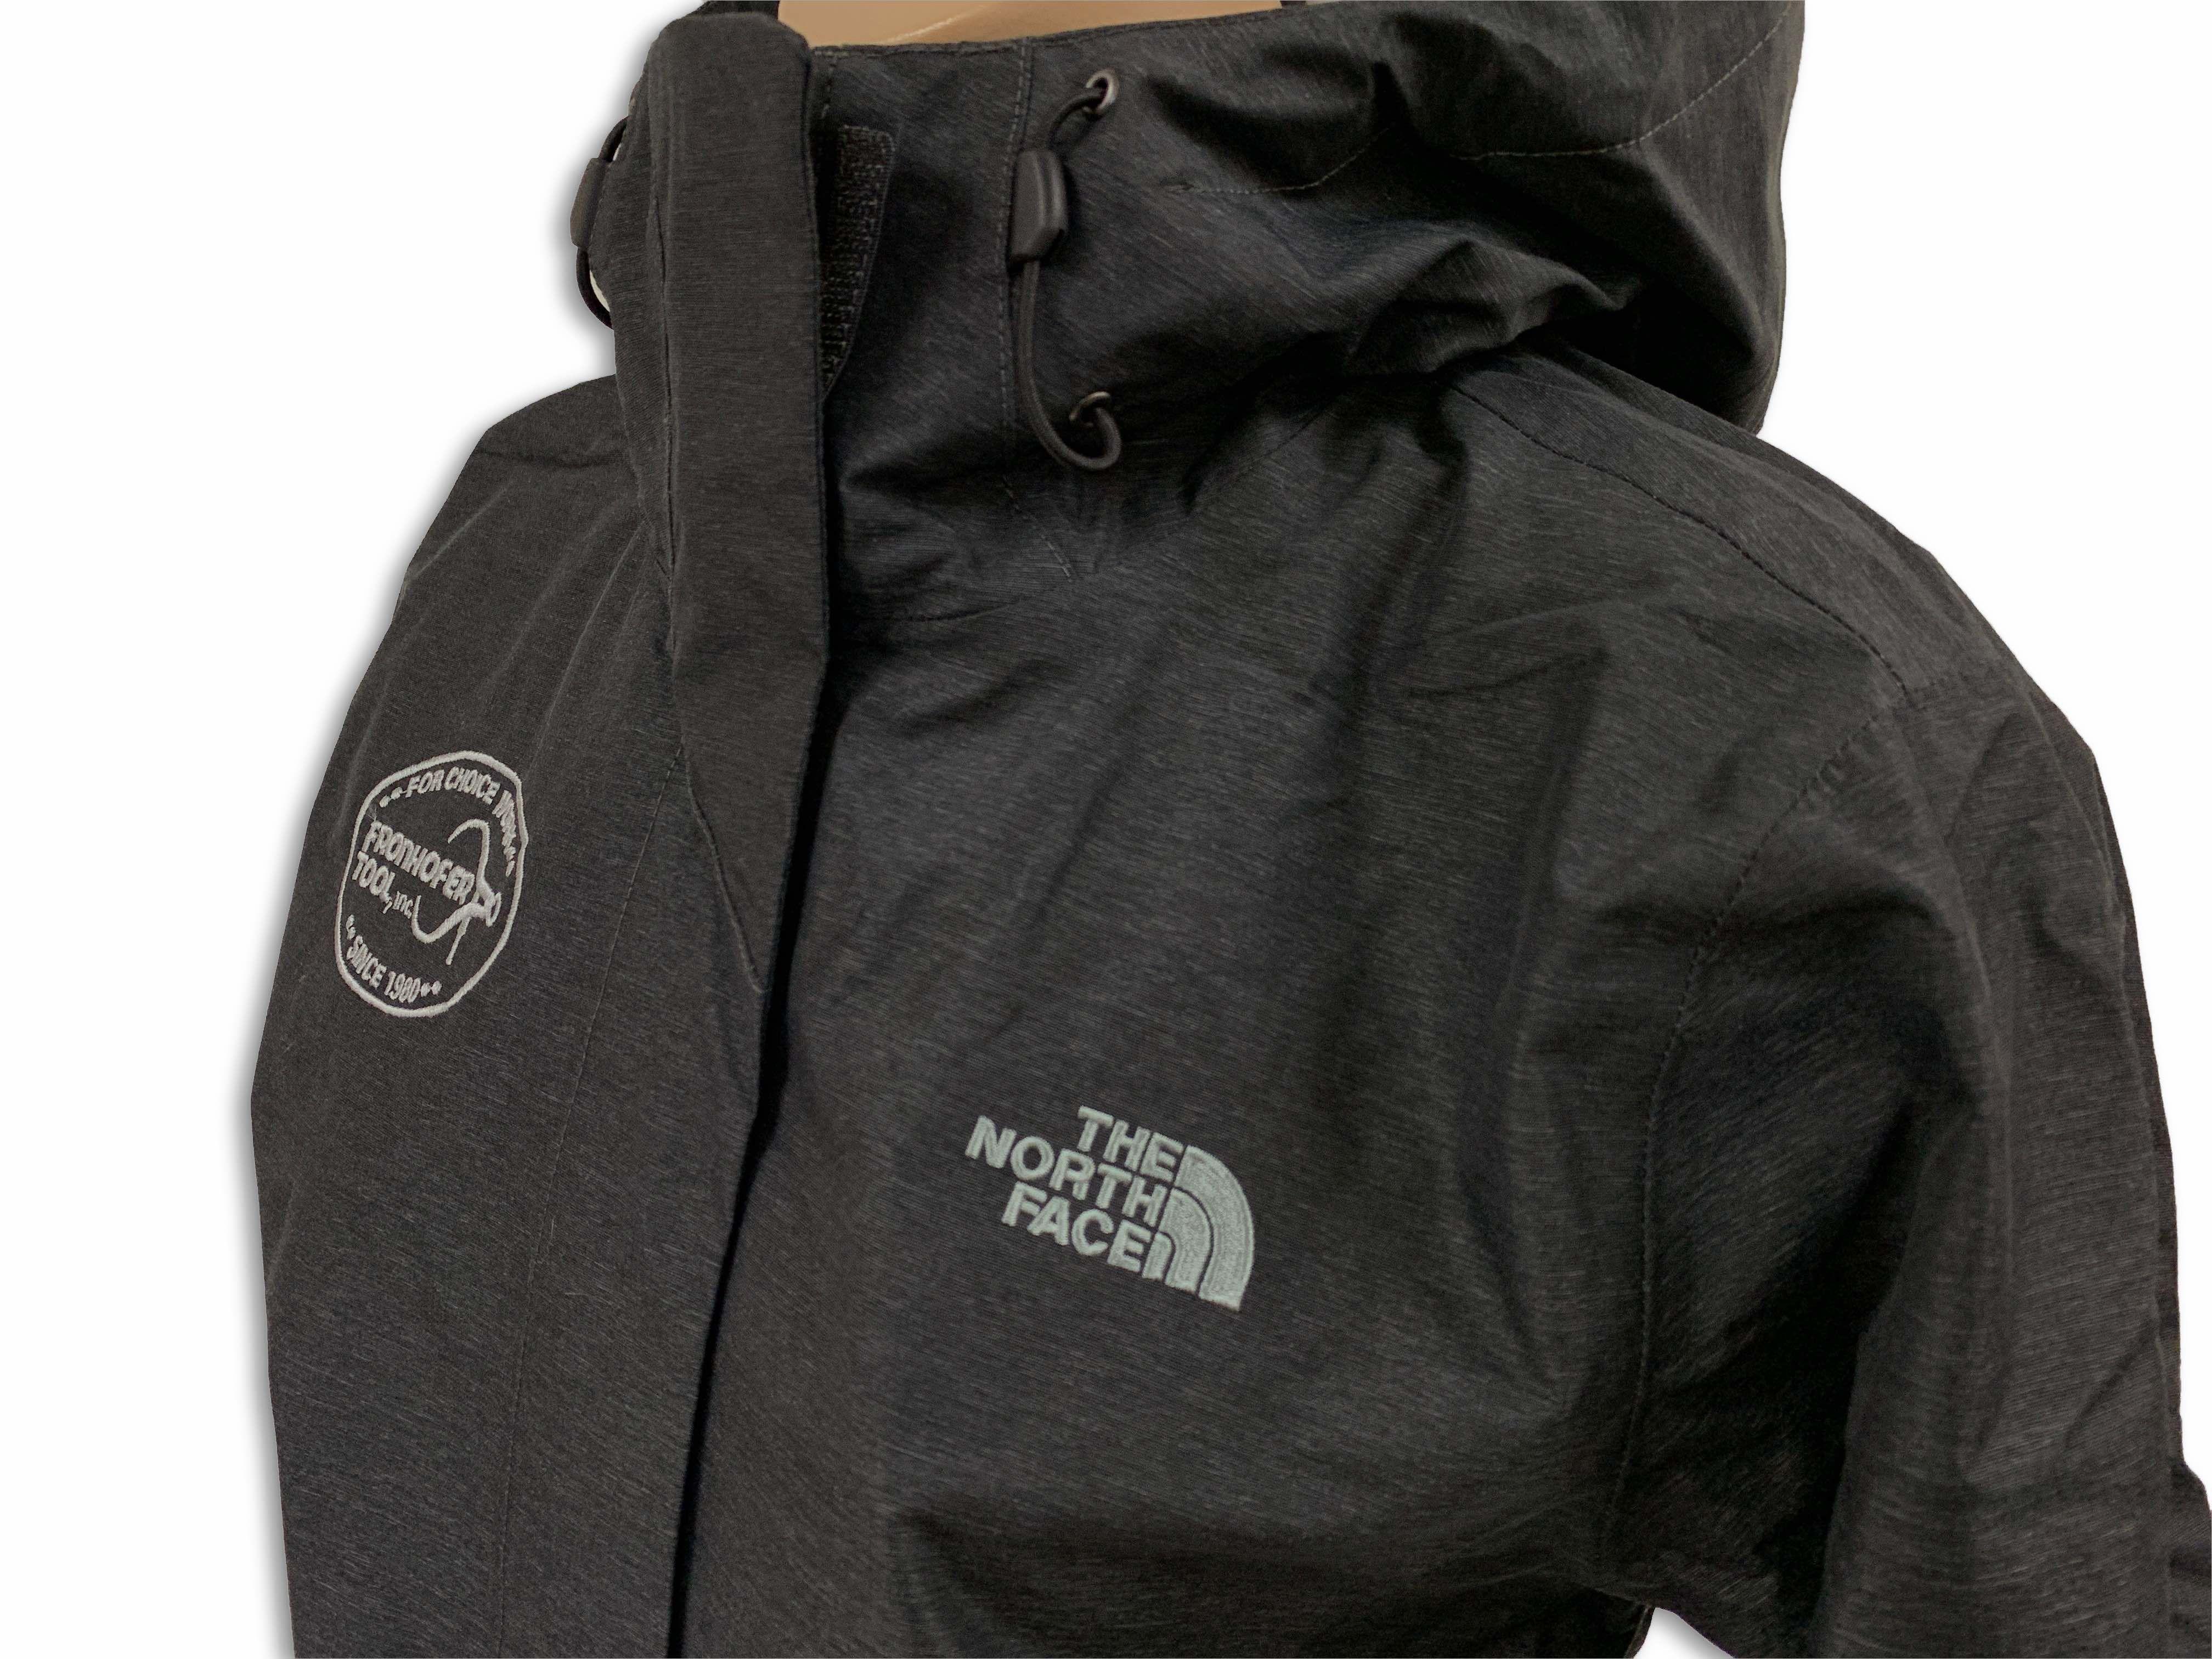 Custom Clothes North Face Jacket